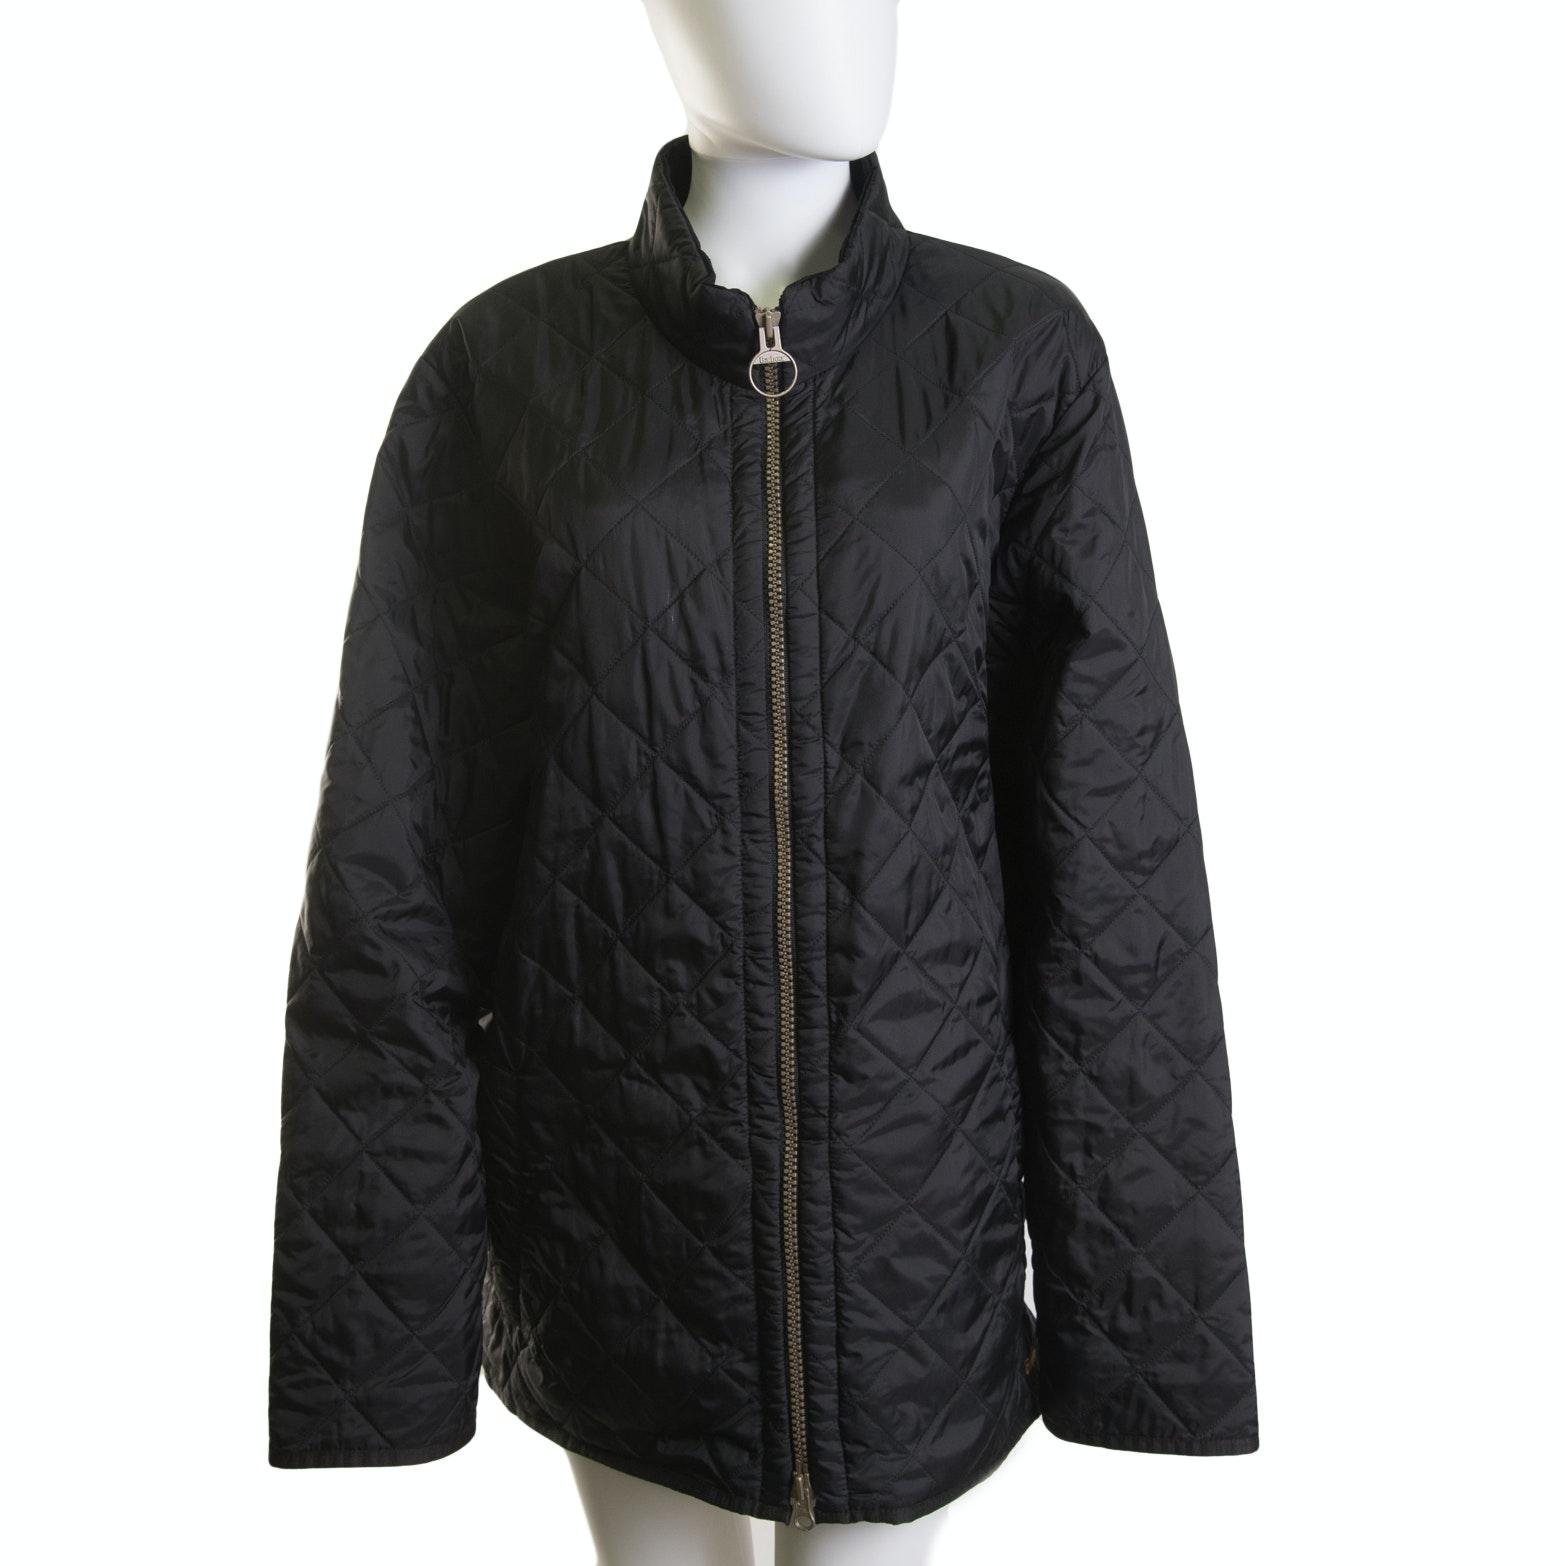 Men's Barbour Black Quilted Jacket